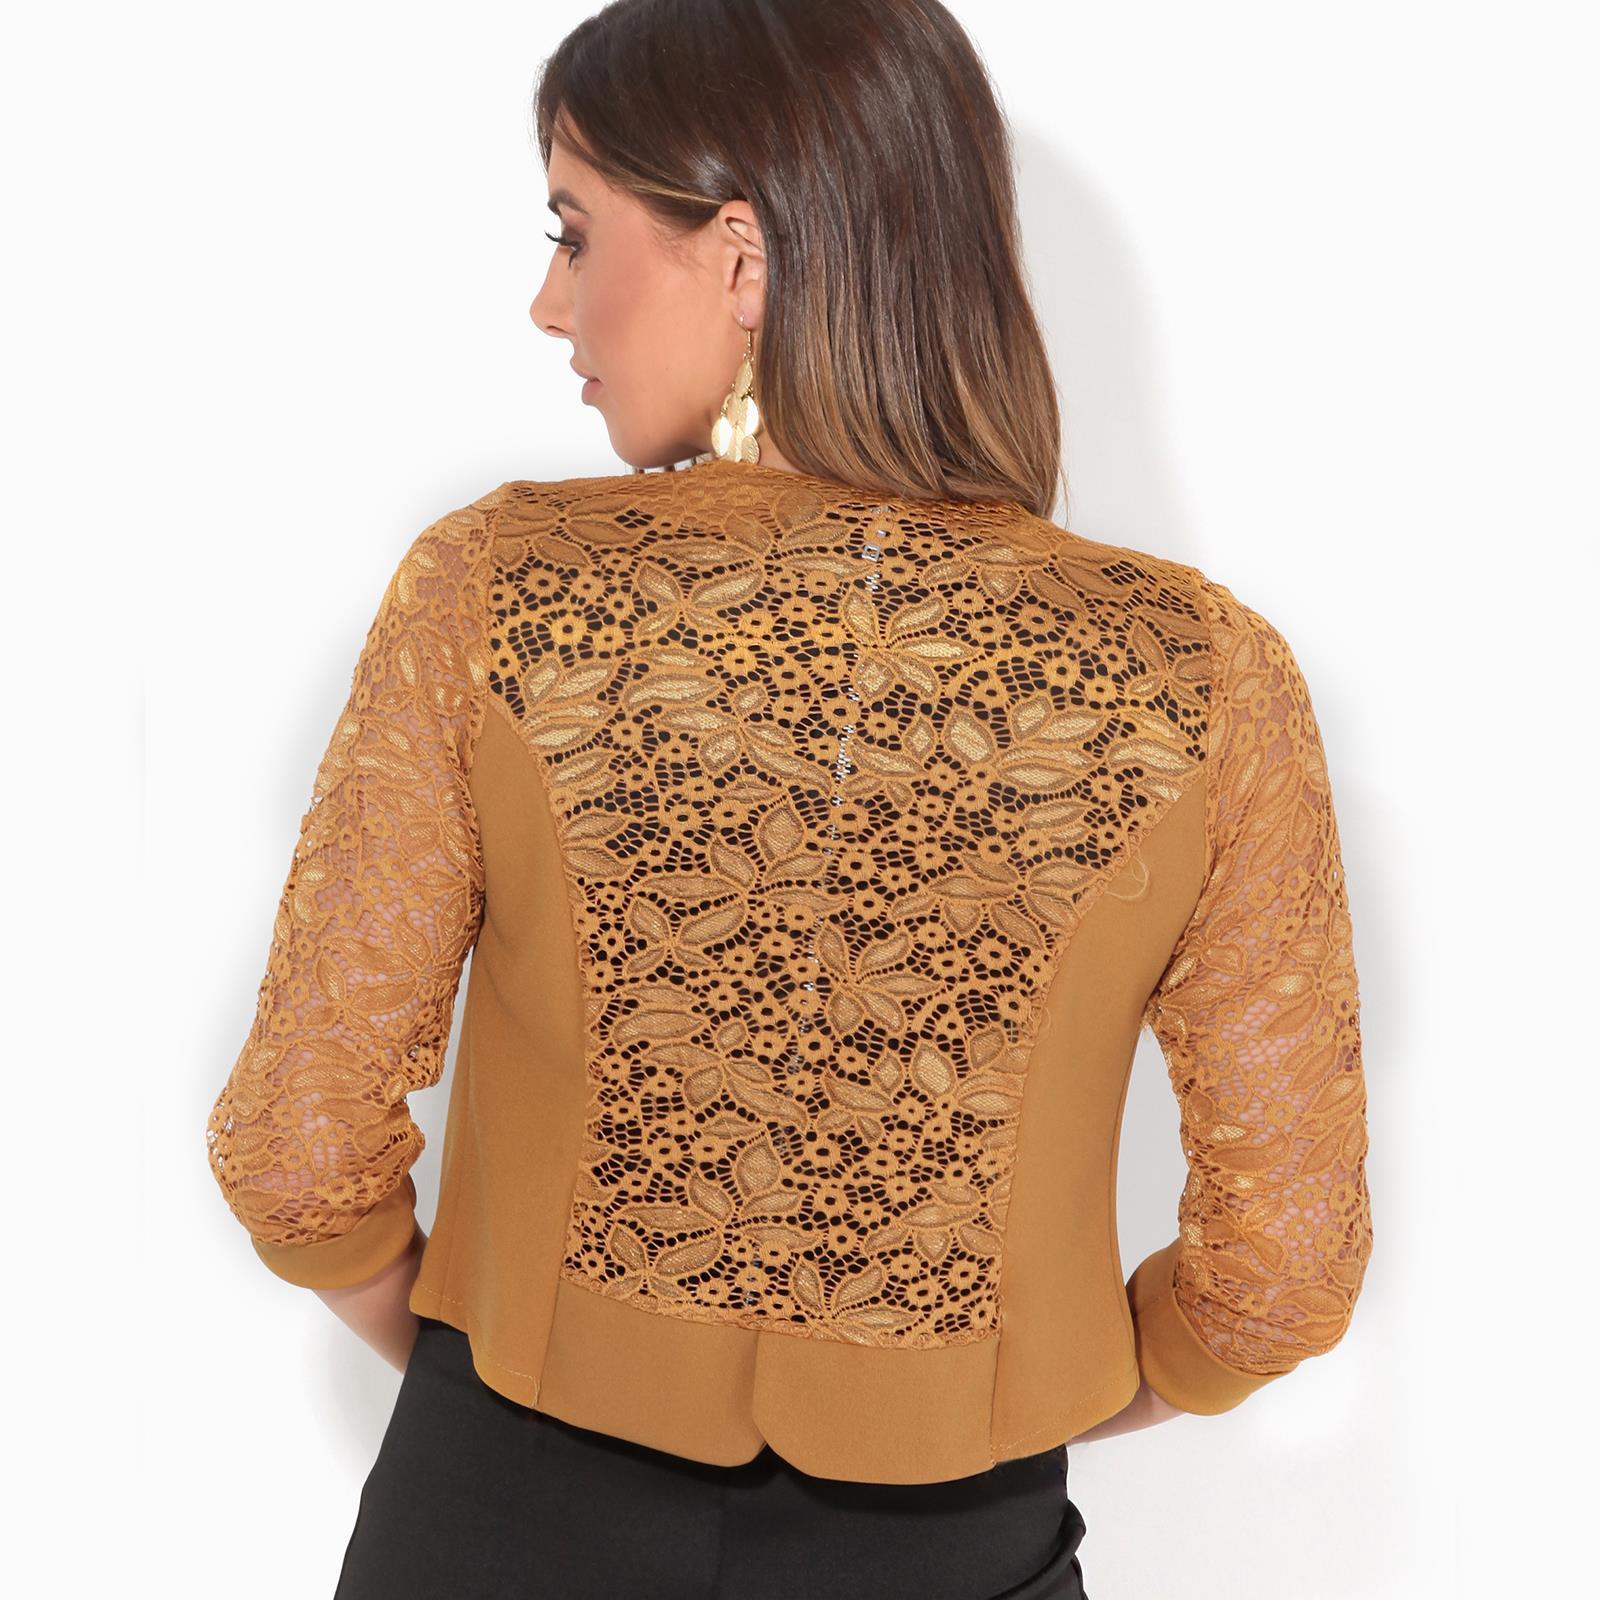 Womens-Ladies-Bolero-Lace-Shrug-Short-Sleeve-Cardigan-Cropped-Party-Top-Jacket thumbnail 11